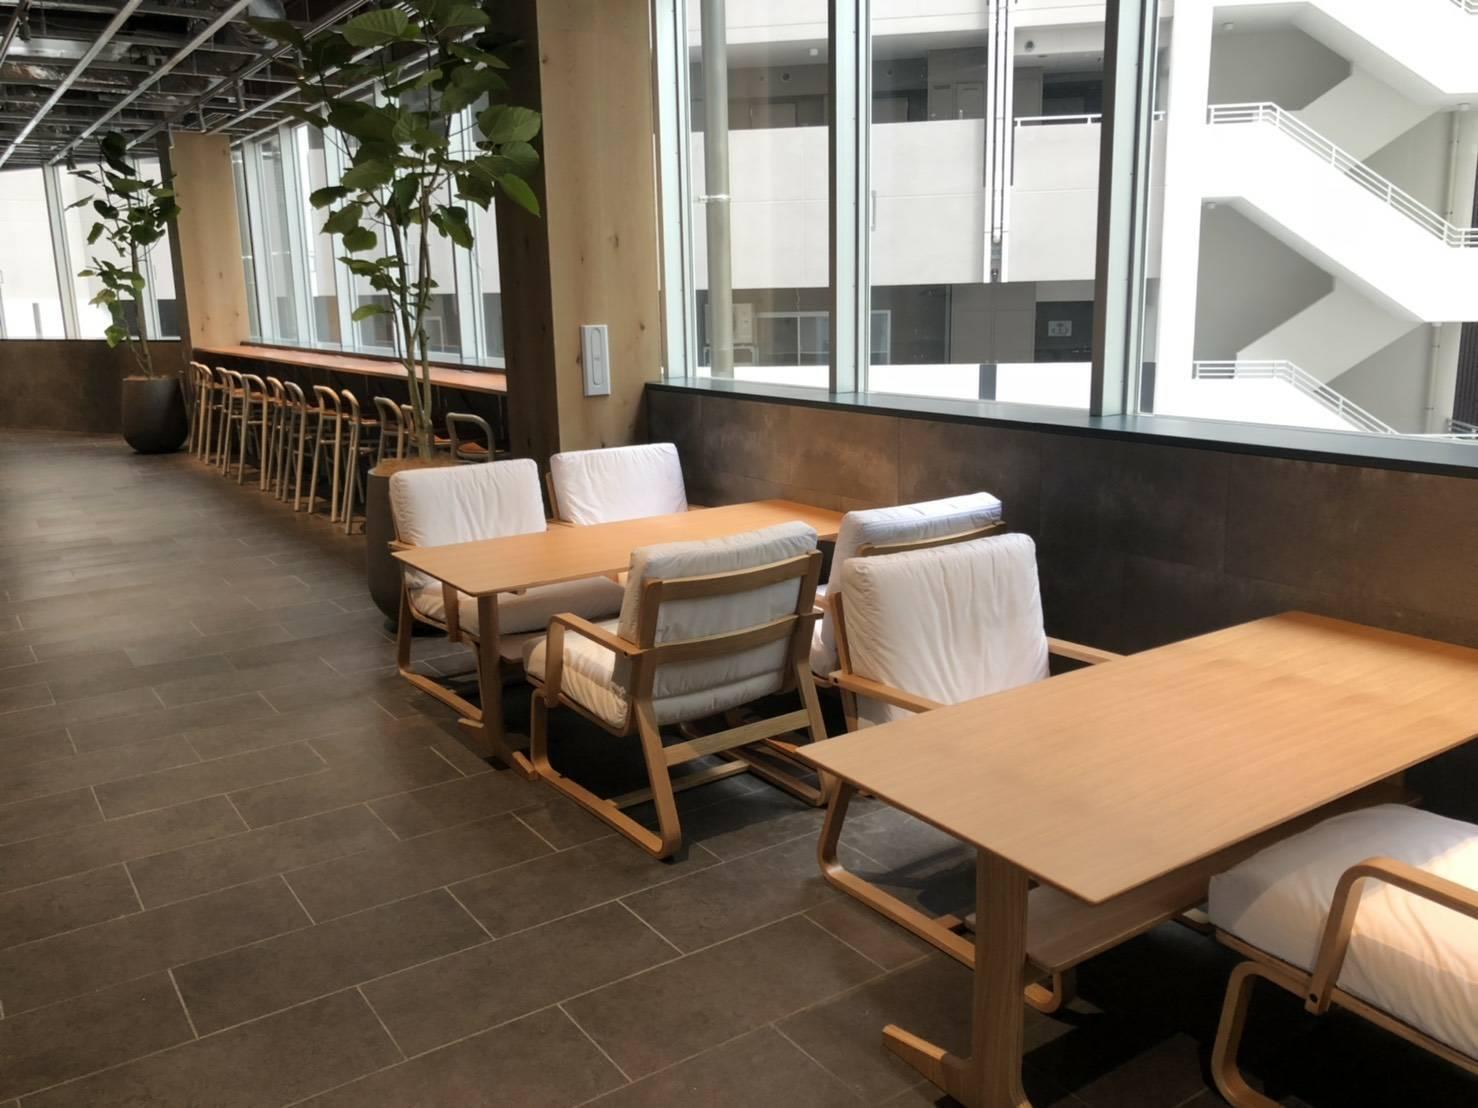 HEARTSバスステーション博多 Cafe&Bar(カフェ・バー)